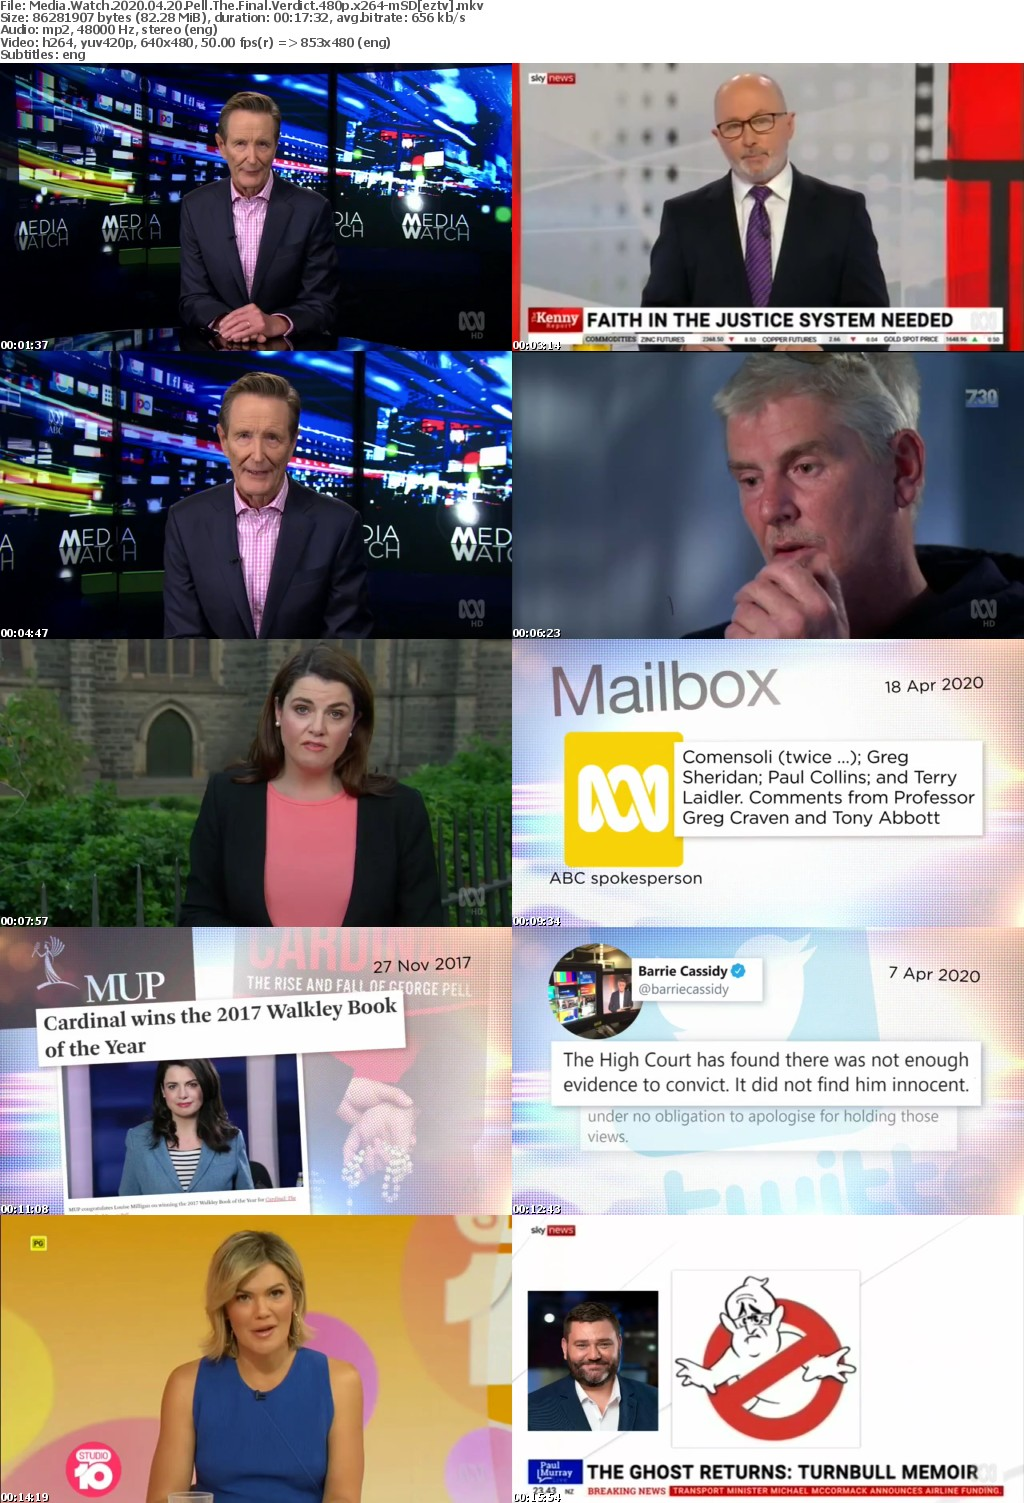 Media Watch 2020 04 20 Pell The Final Verdict 480p x264-mSD